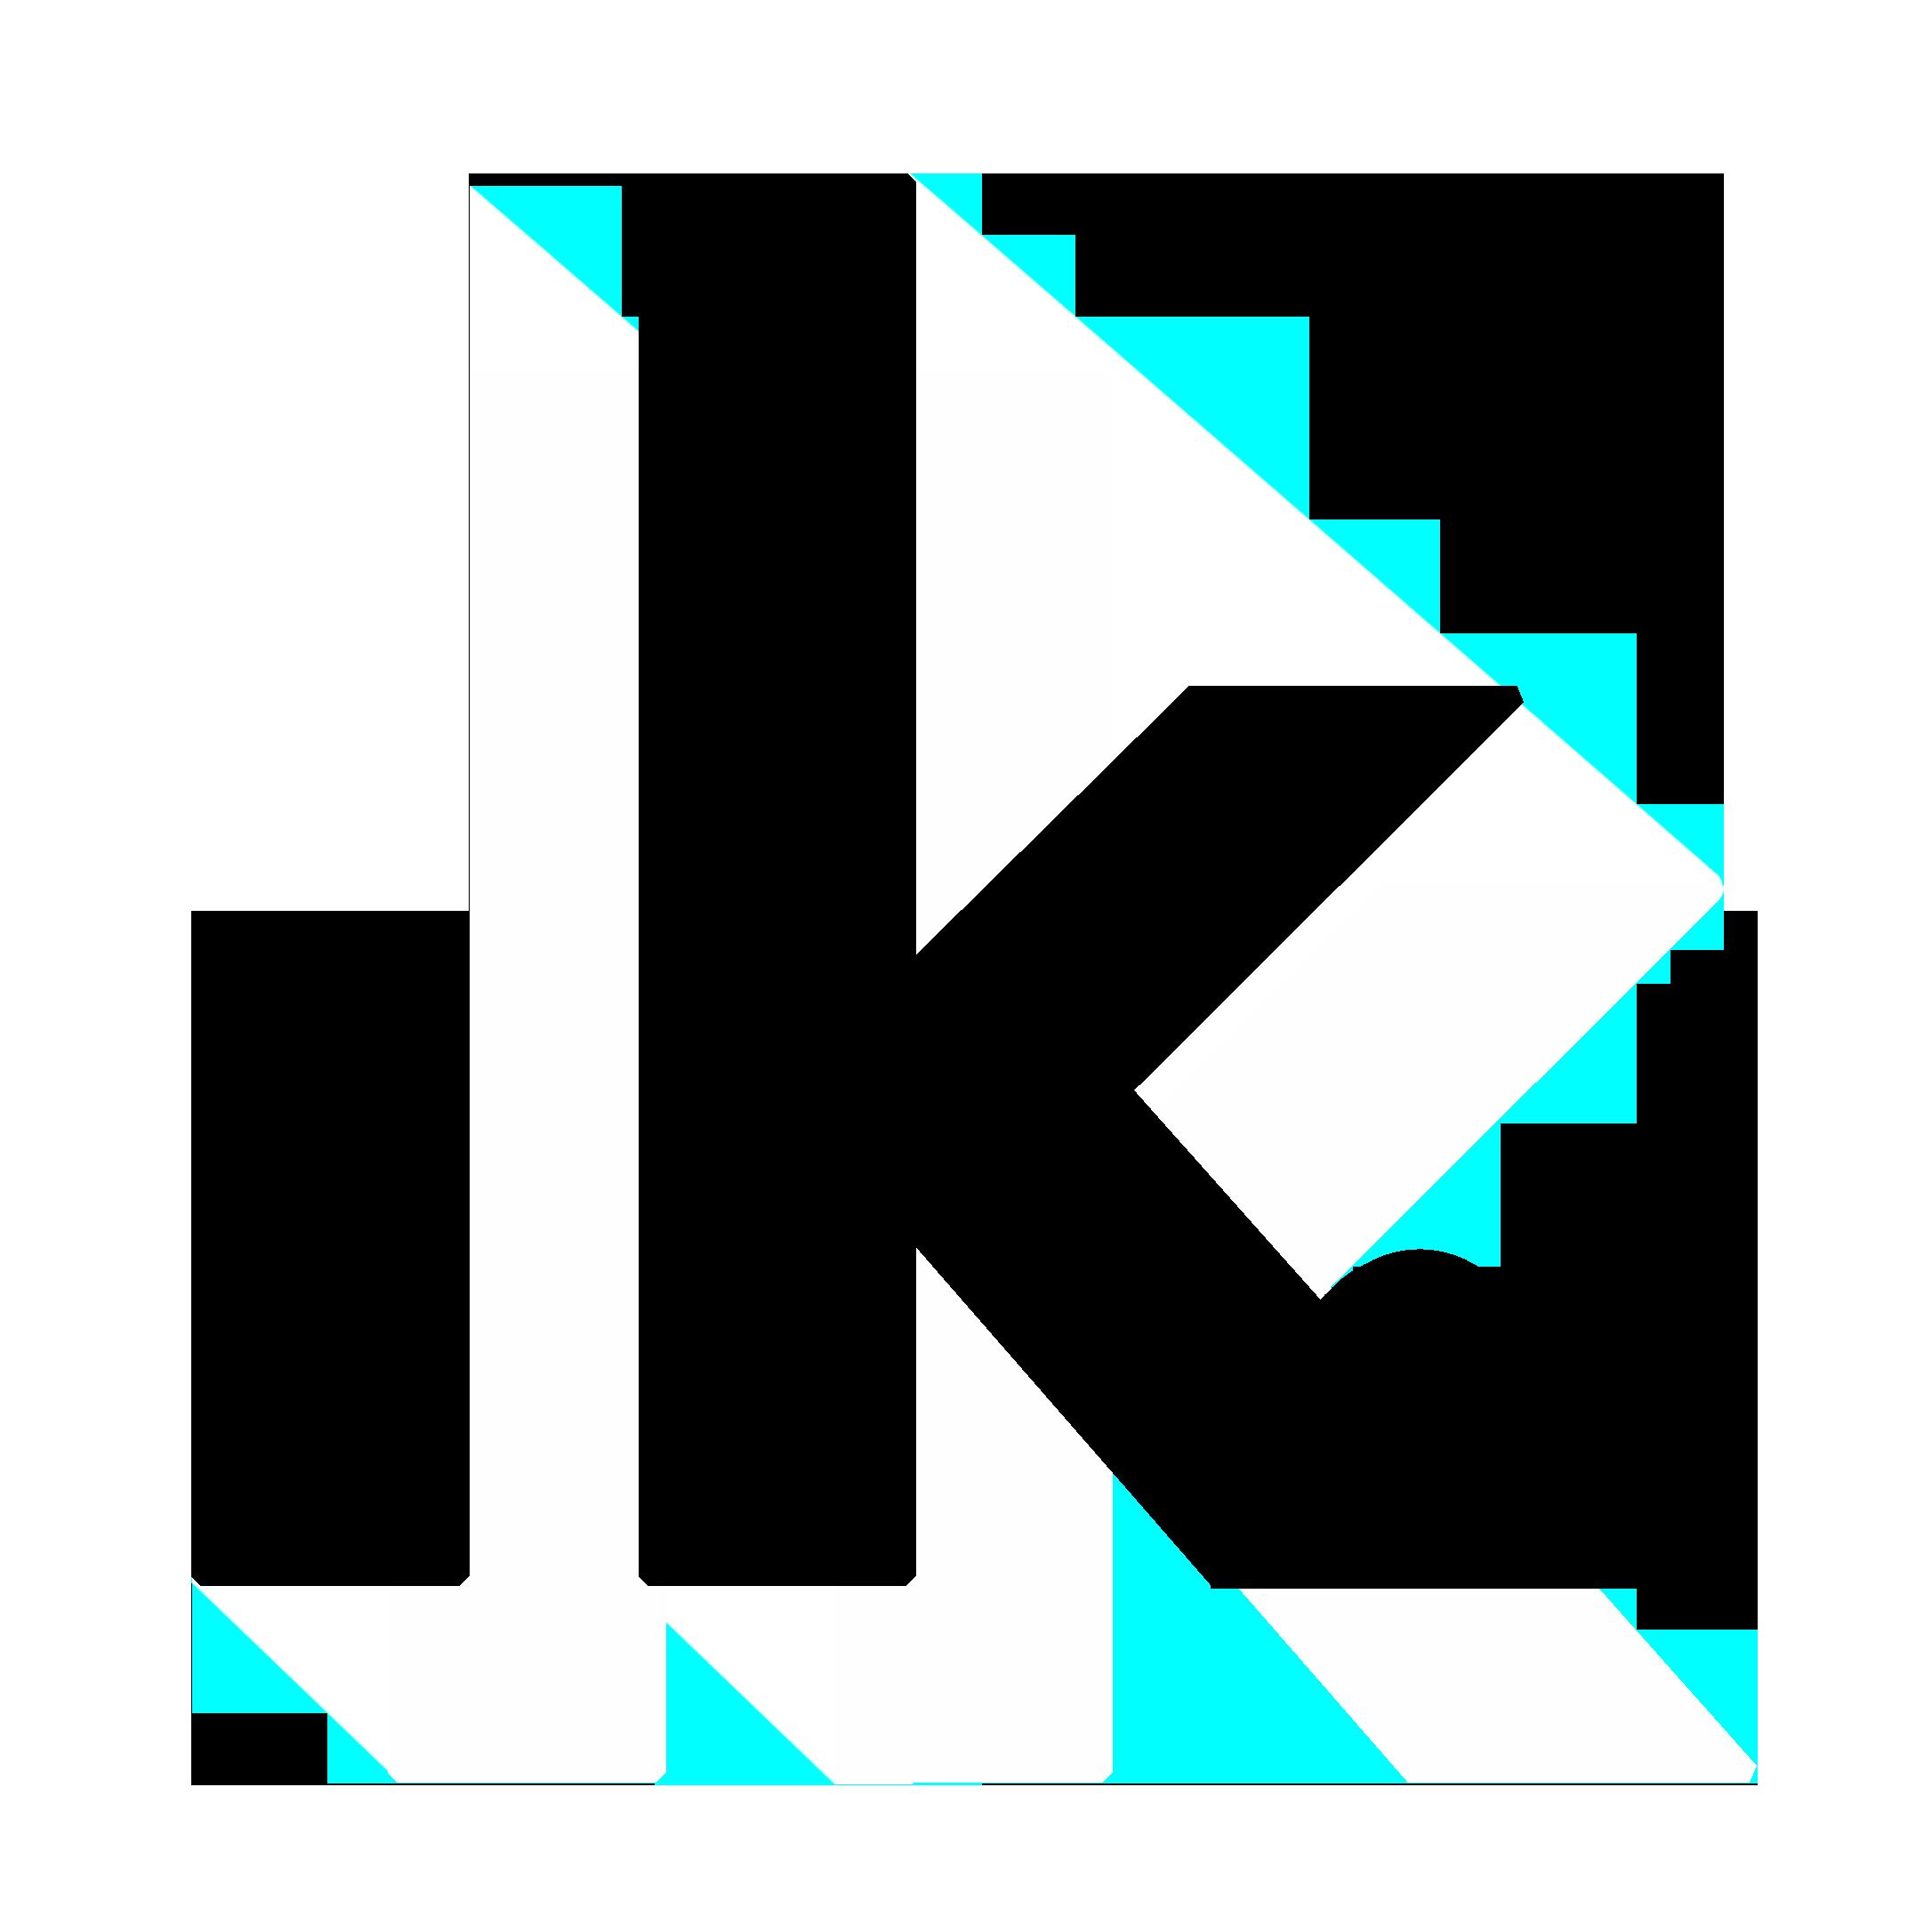 lk_extrude invert